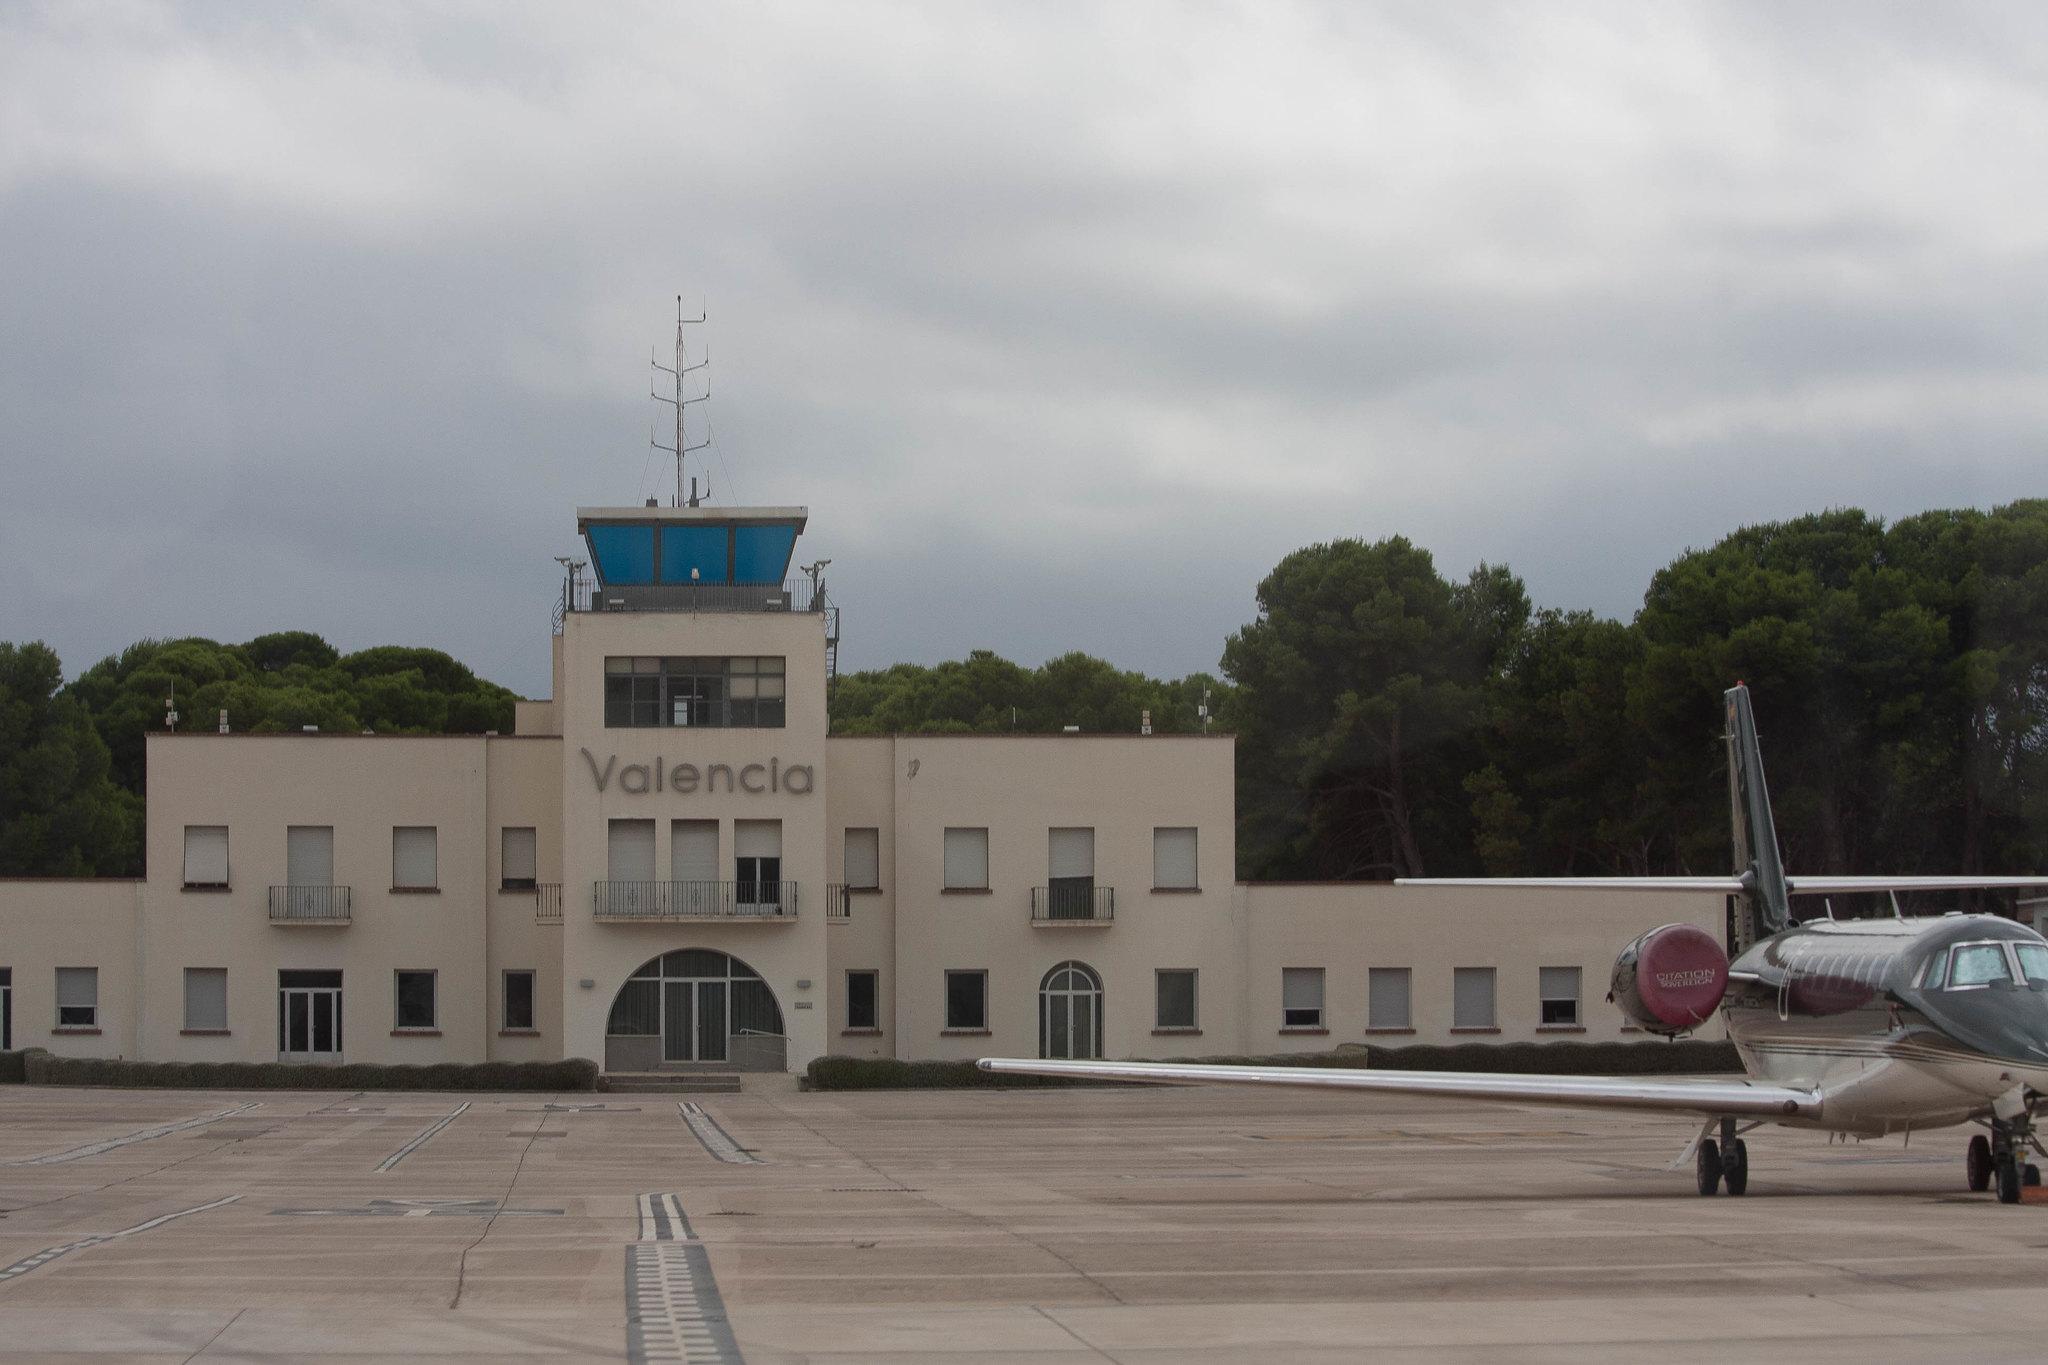 valencia airport outside